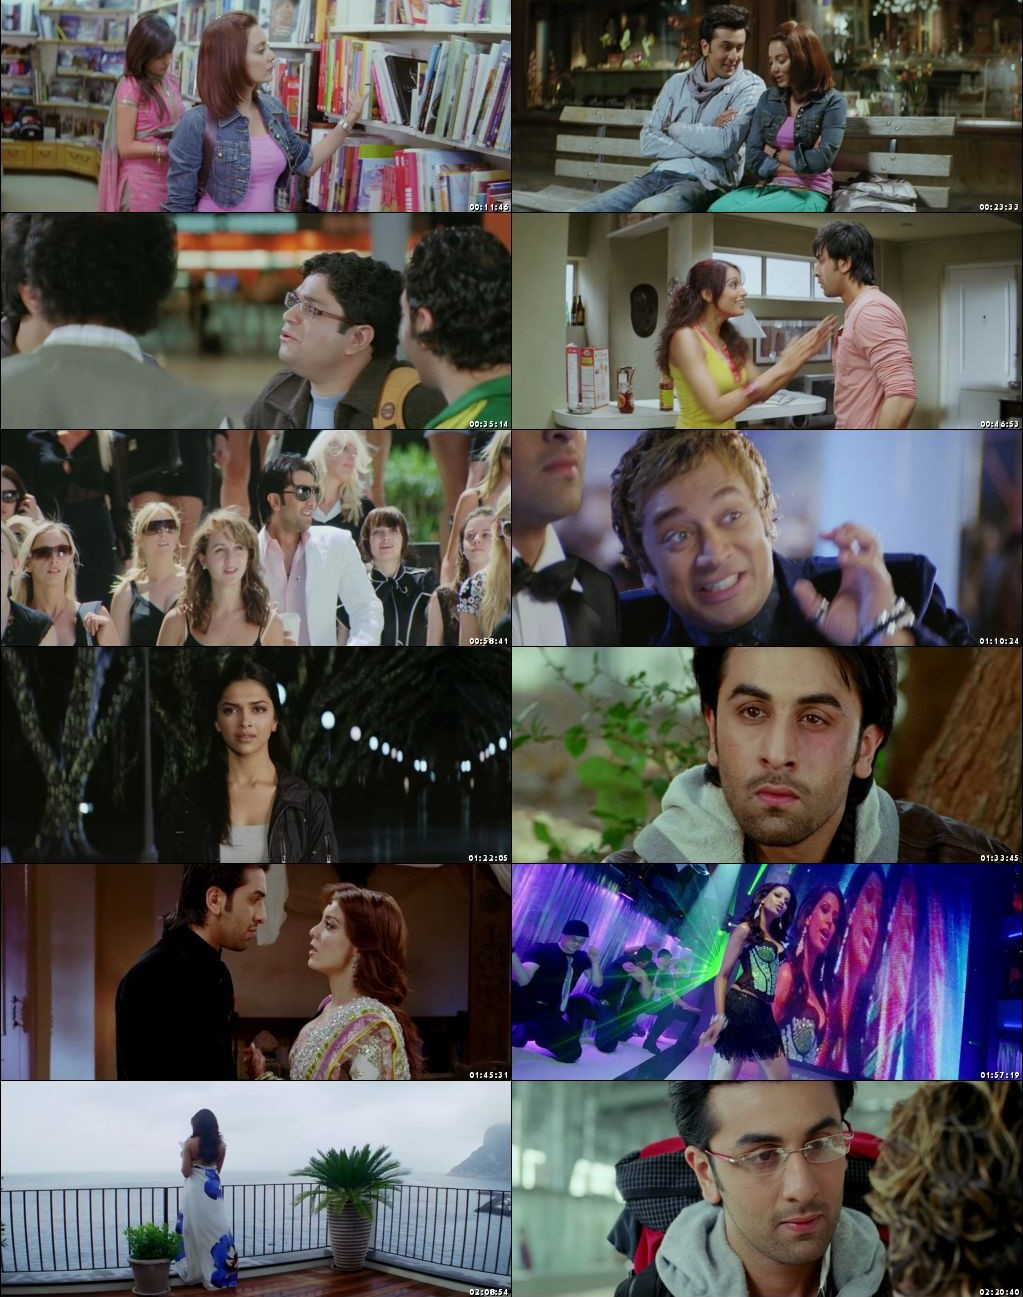 Bachna Ae Haseeno 2008 Full Hindi Movie Online Watch